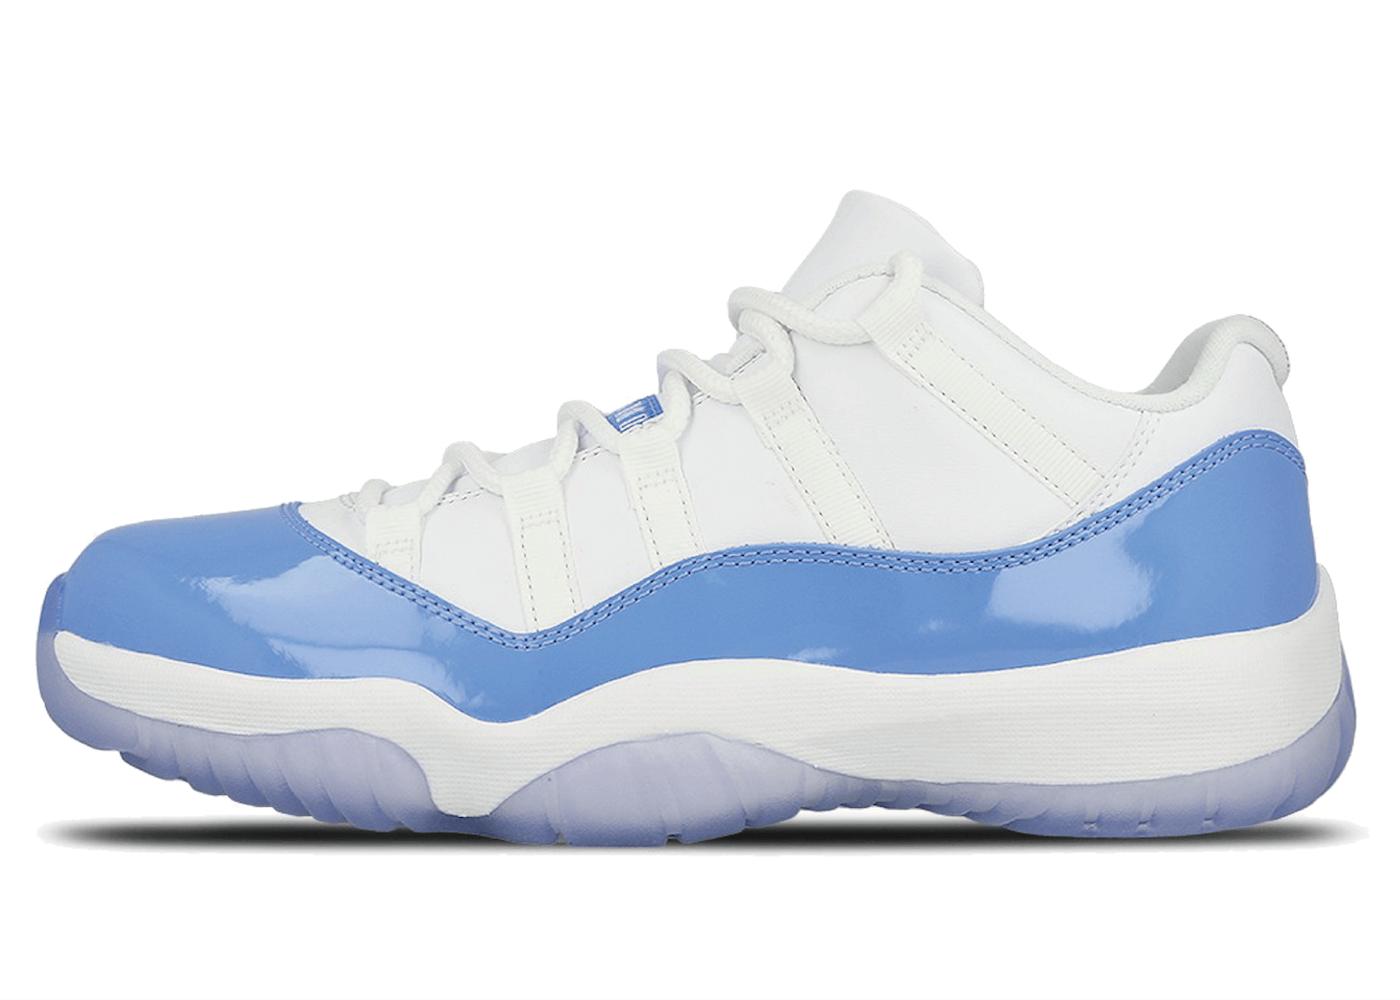 Jordan 11 Retro Low University Blue (2017)の写真